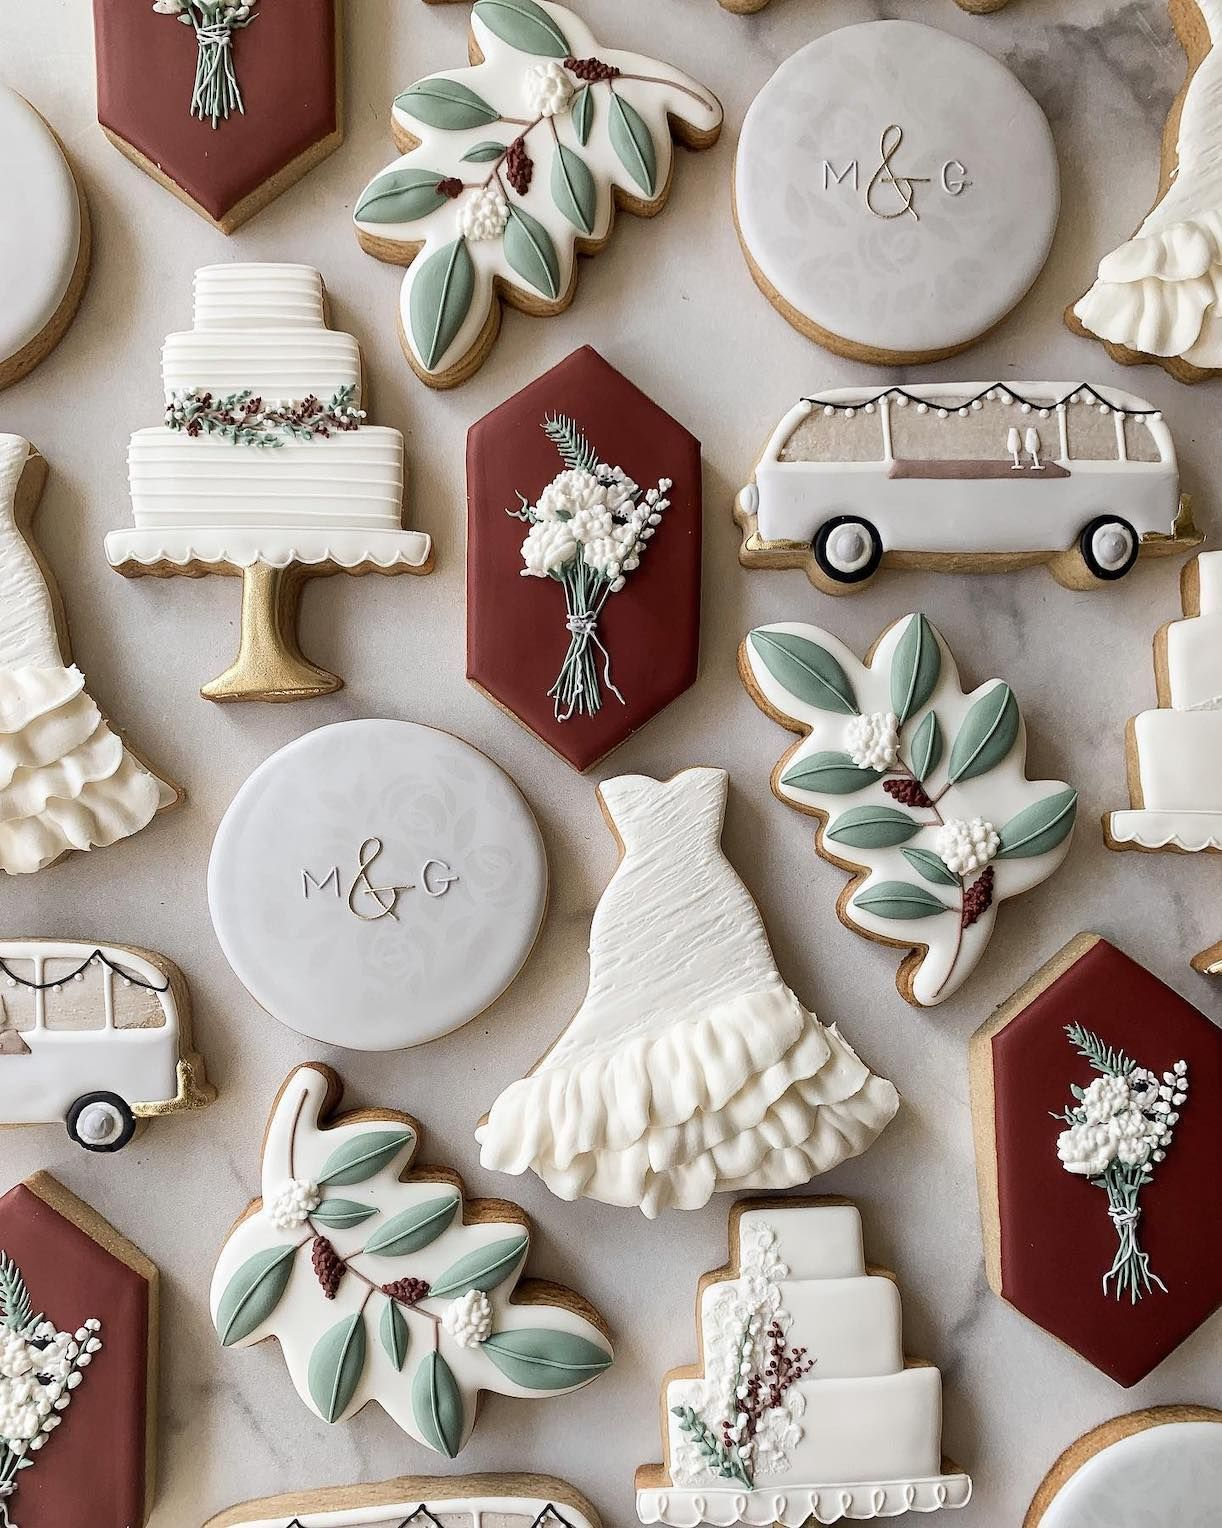 13 Amazing Custom Cookies Accounts to Follow Immed